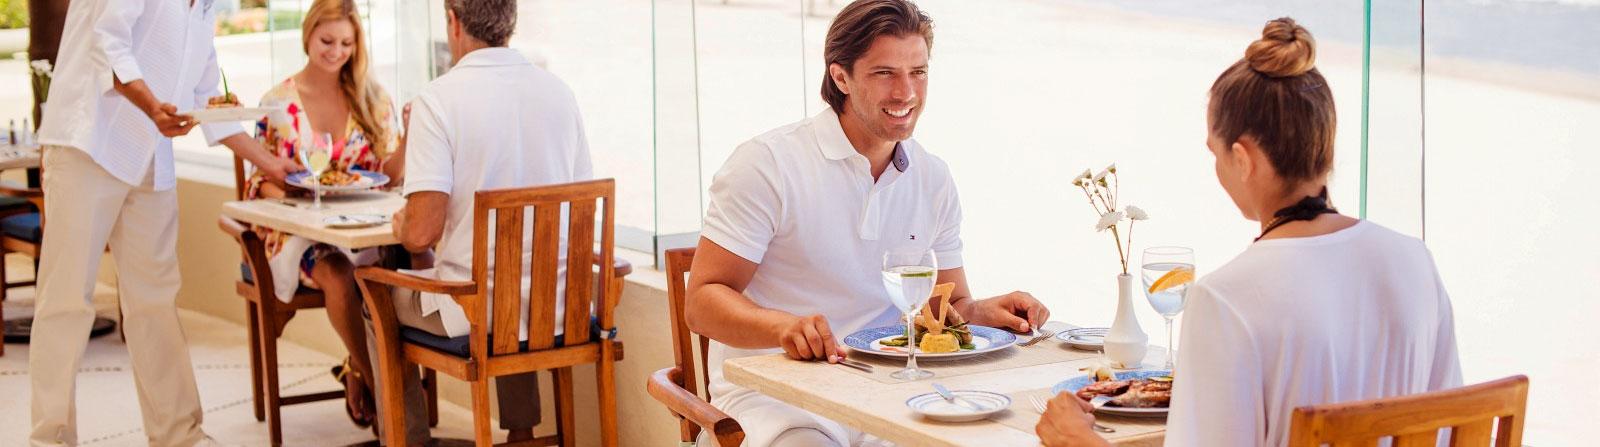 Restaurants of Grand Velas Riviera Nayarit Mexico